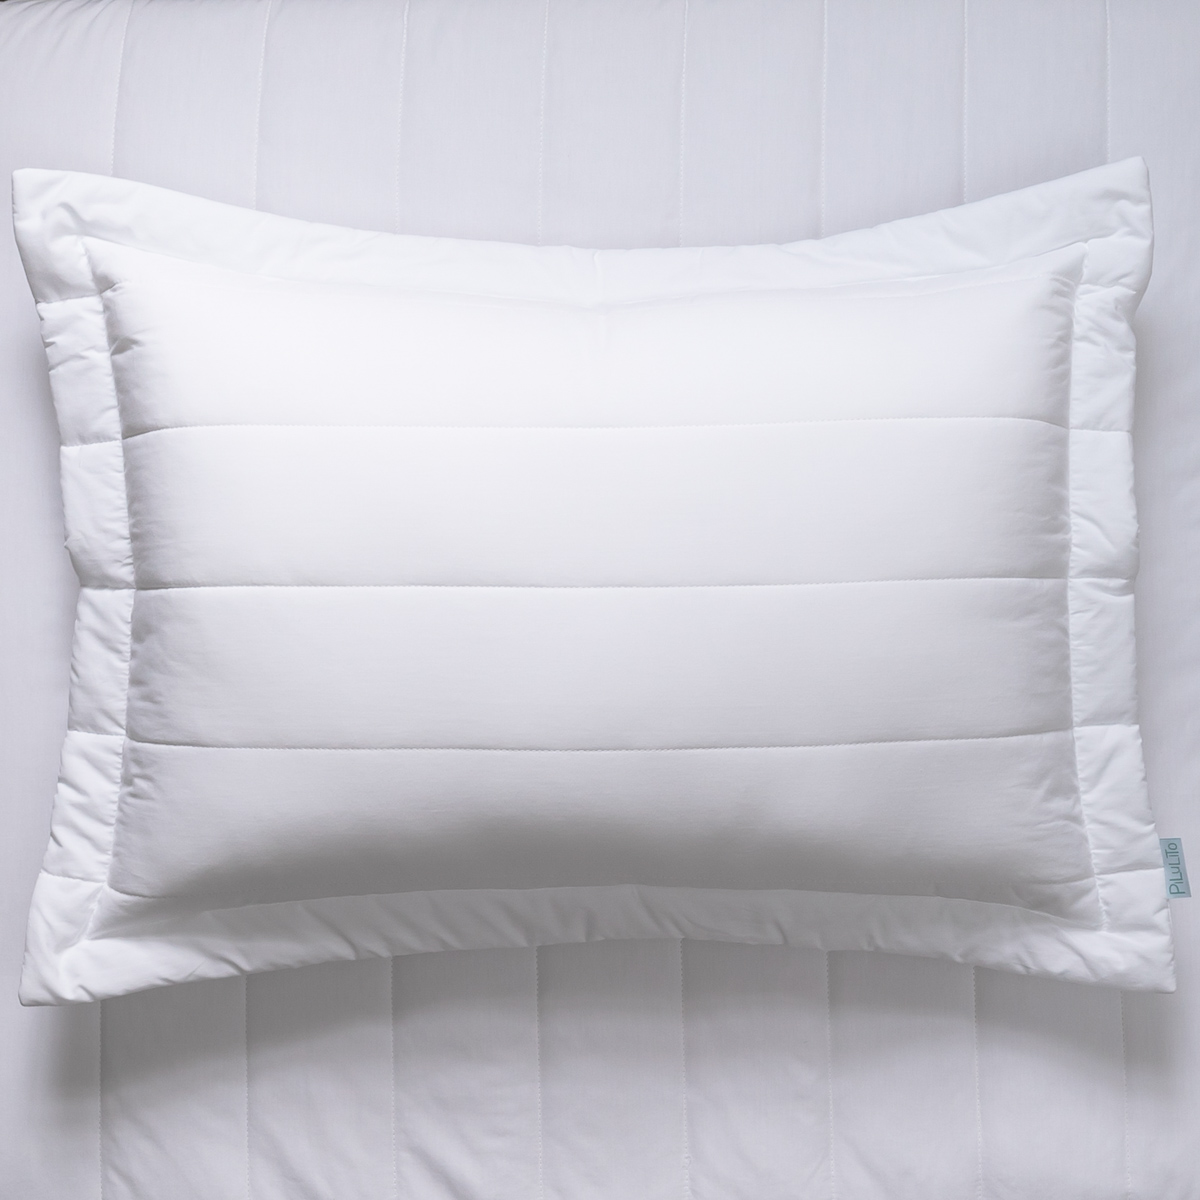 Porta Travesseiro Percal 200 Fios Listras Branca